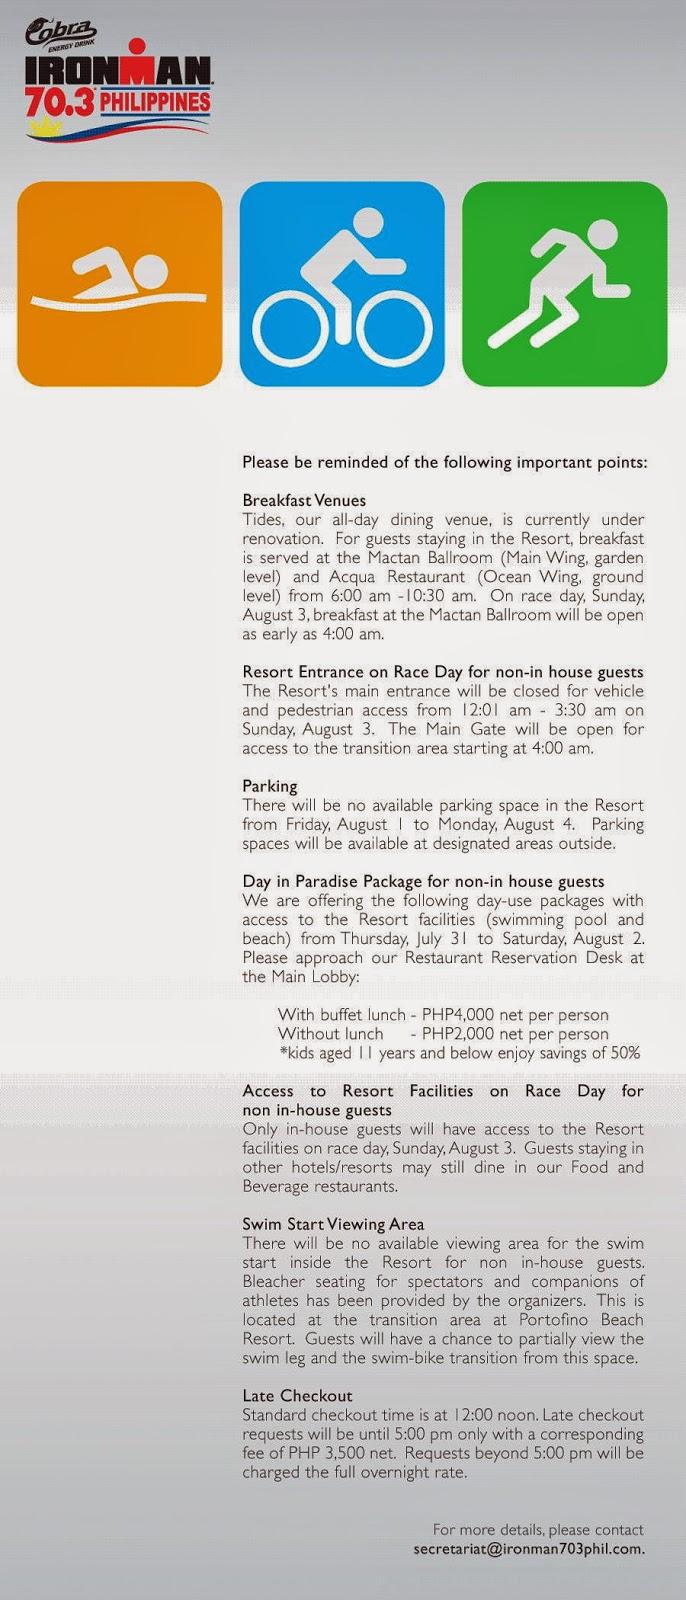 Cobra+Ironman+70.3+Philippines-2014-Guide